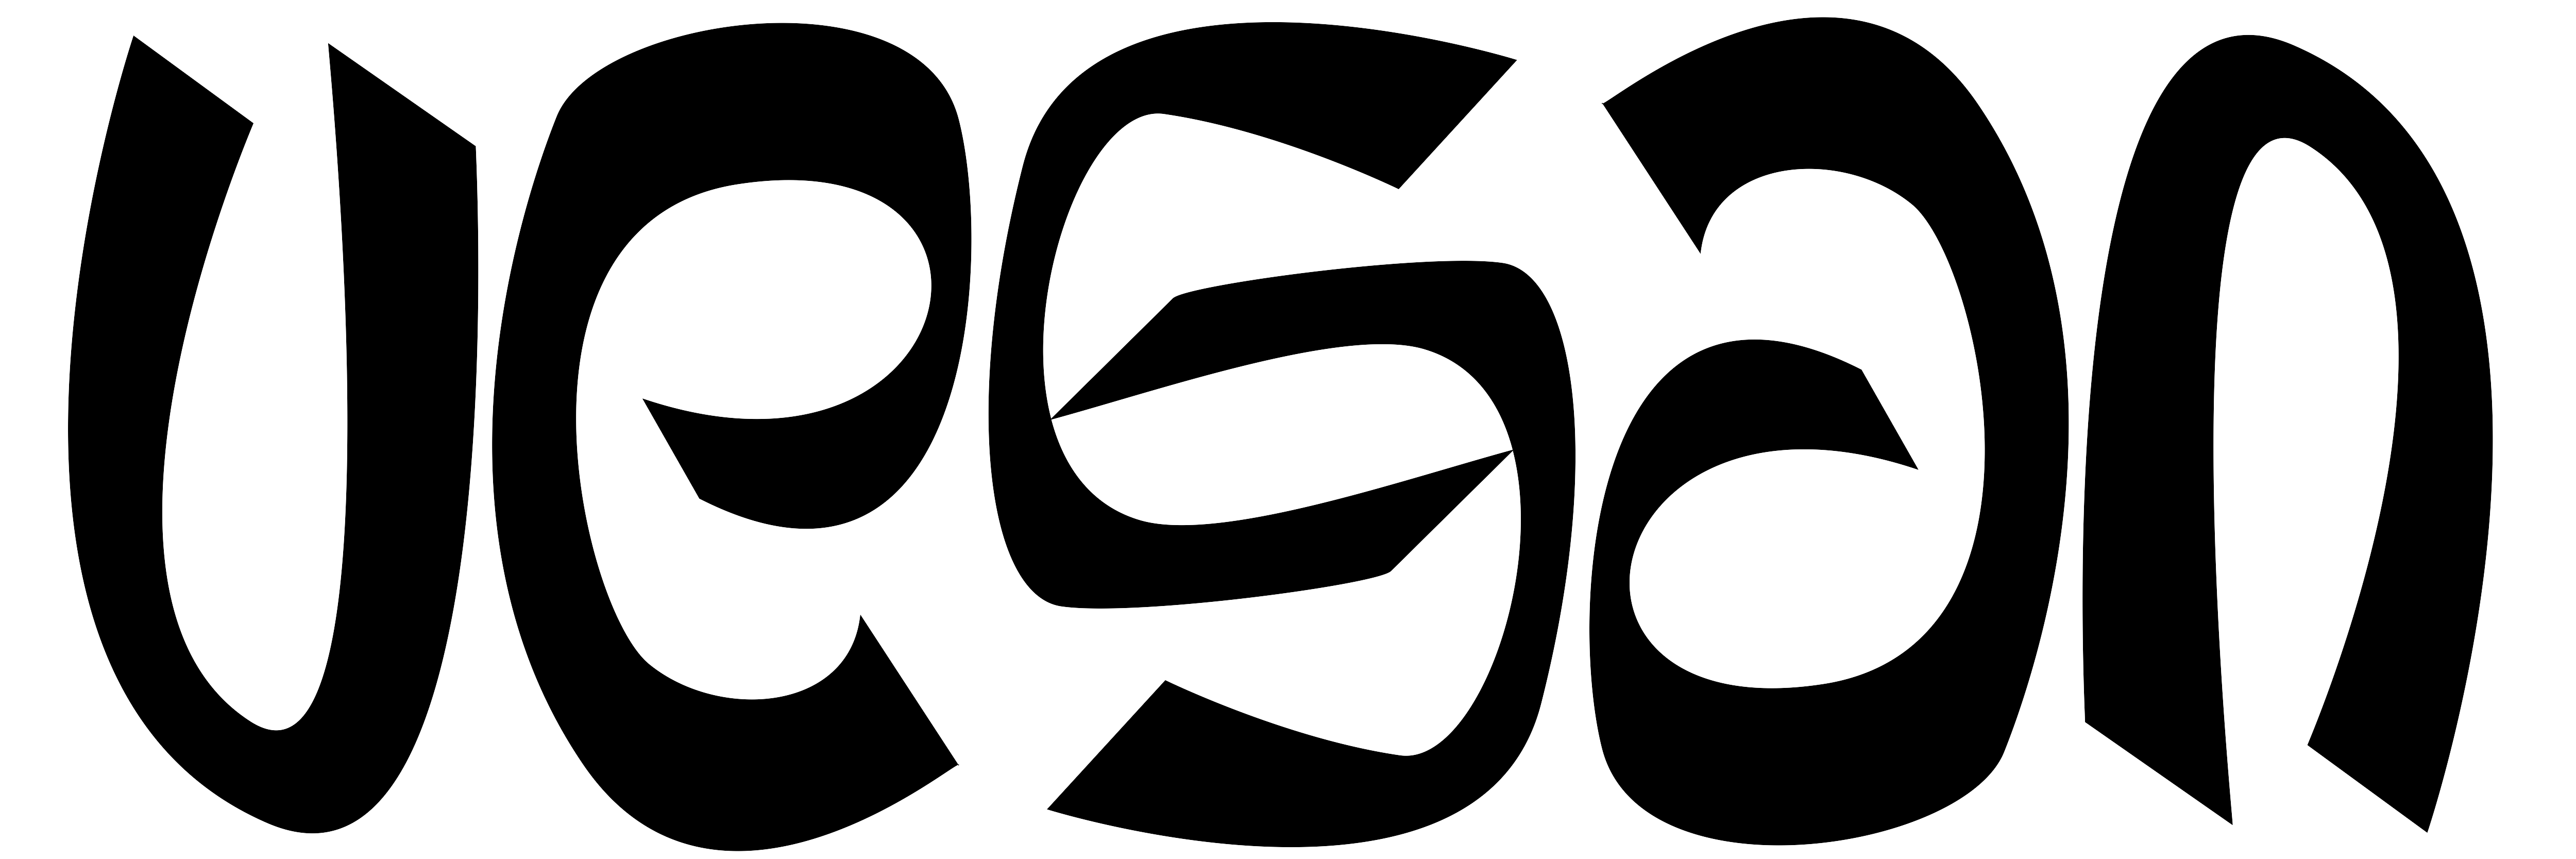 vegan symbol emojis copyright free clipart copypaste transparent png image file 5000px transparent png buycottarizona